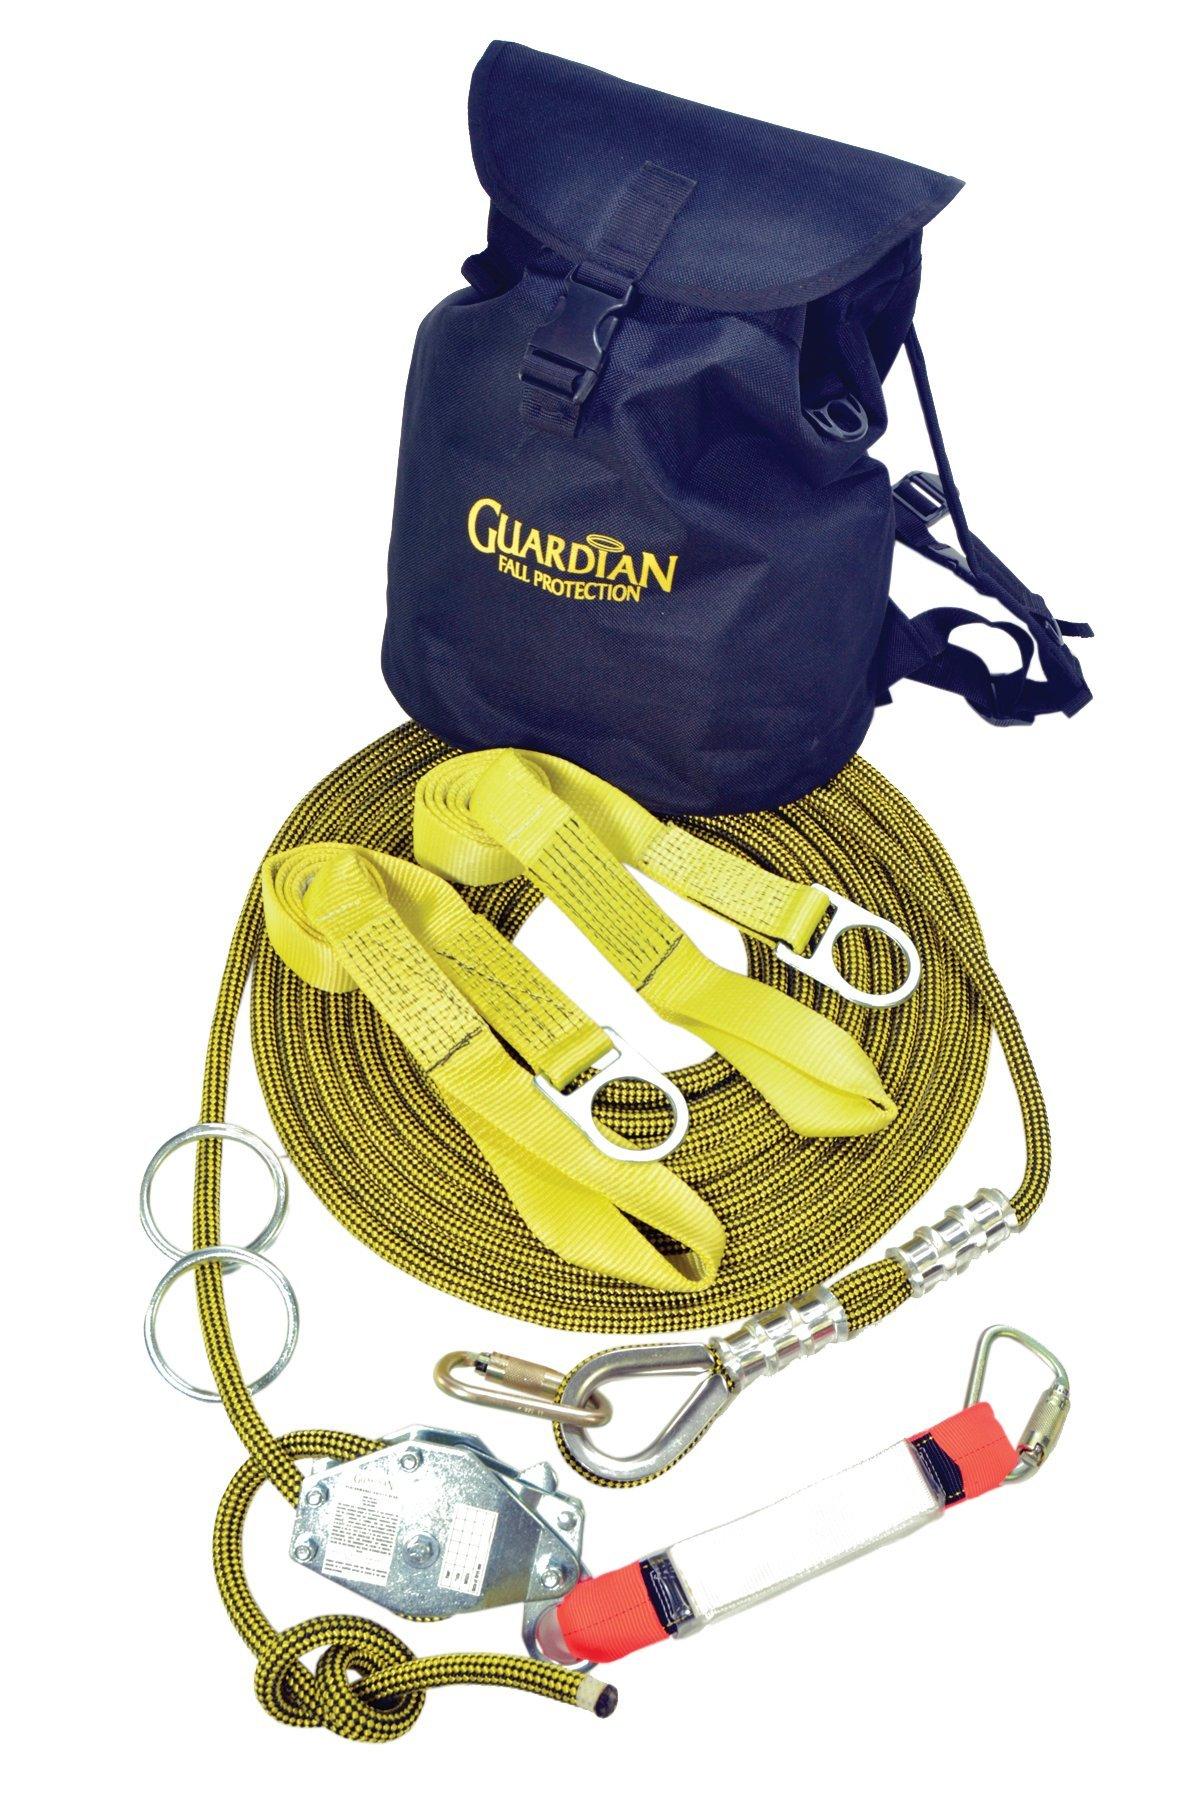 Guardian Fall Protection 04639 Kernmantle Horizontal Lifeline System with Tensioner, 2 O-Rings, 2 Web Slings, 2 Steel Carabineers and SOS-Bag, 60-Foot